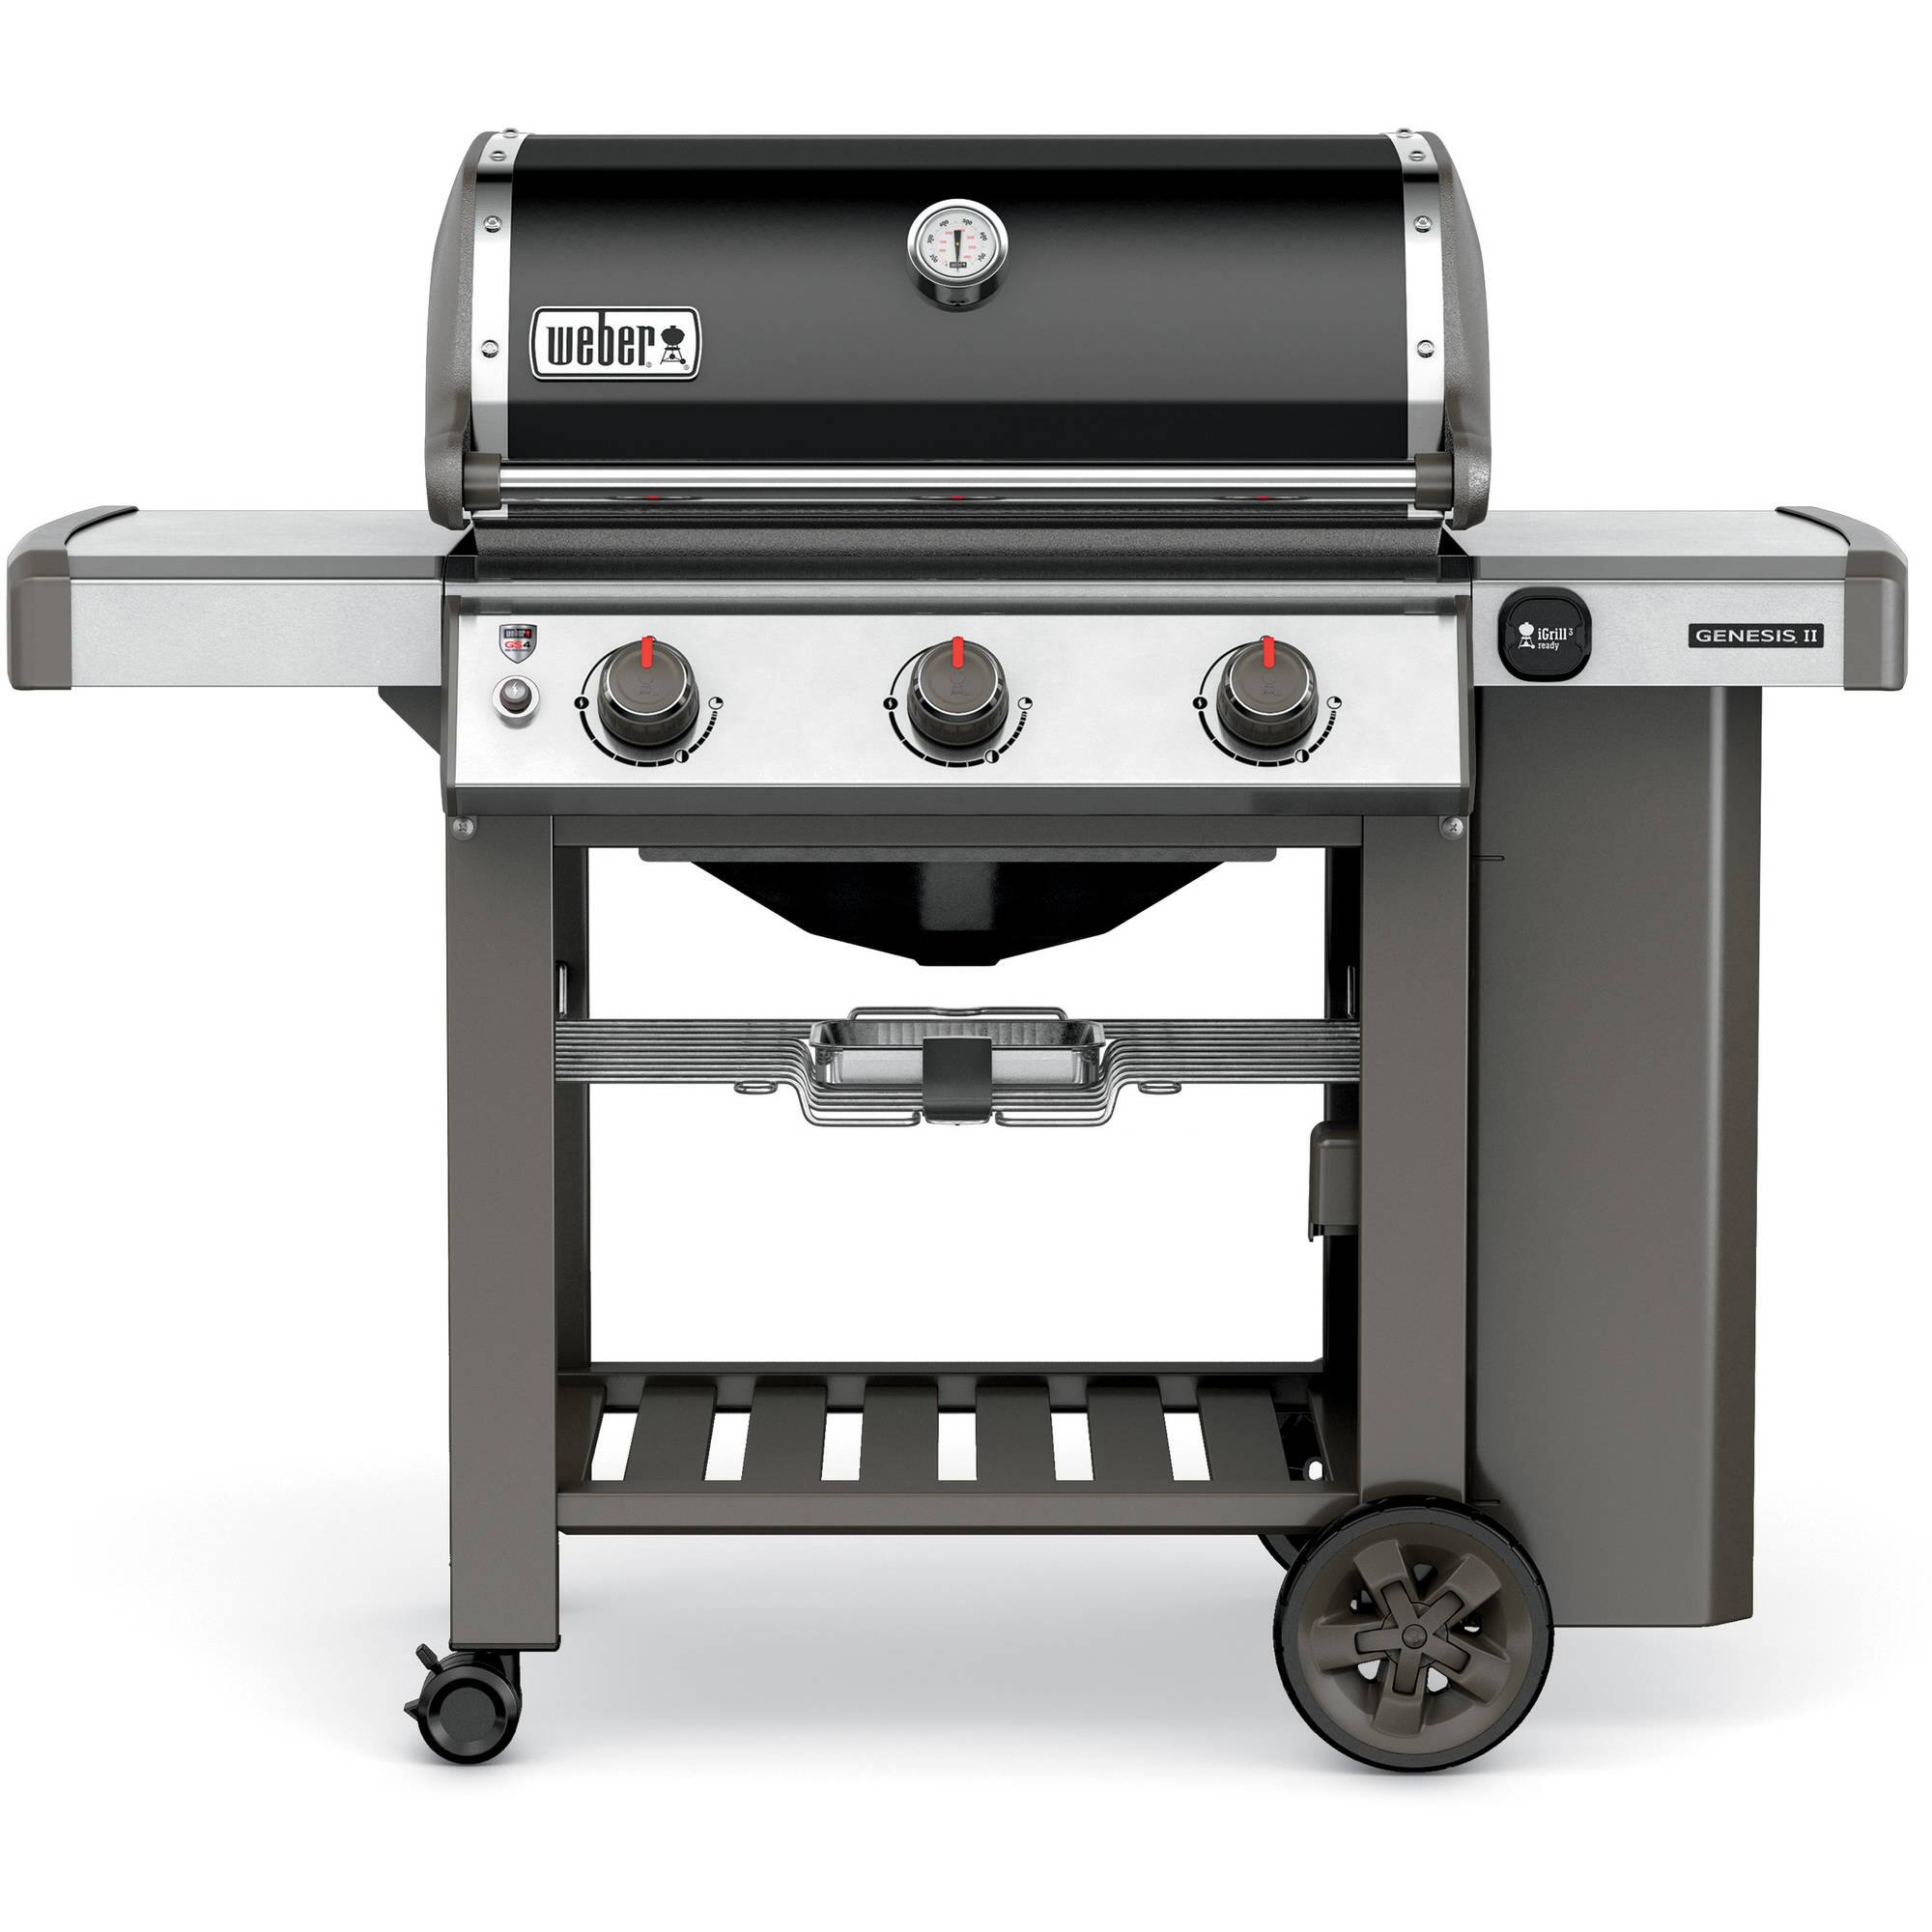 Weber Genesis II E-310 $499 & Spirit E-210 $299 Walmart YMMV